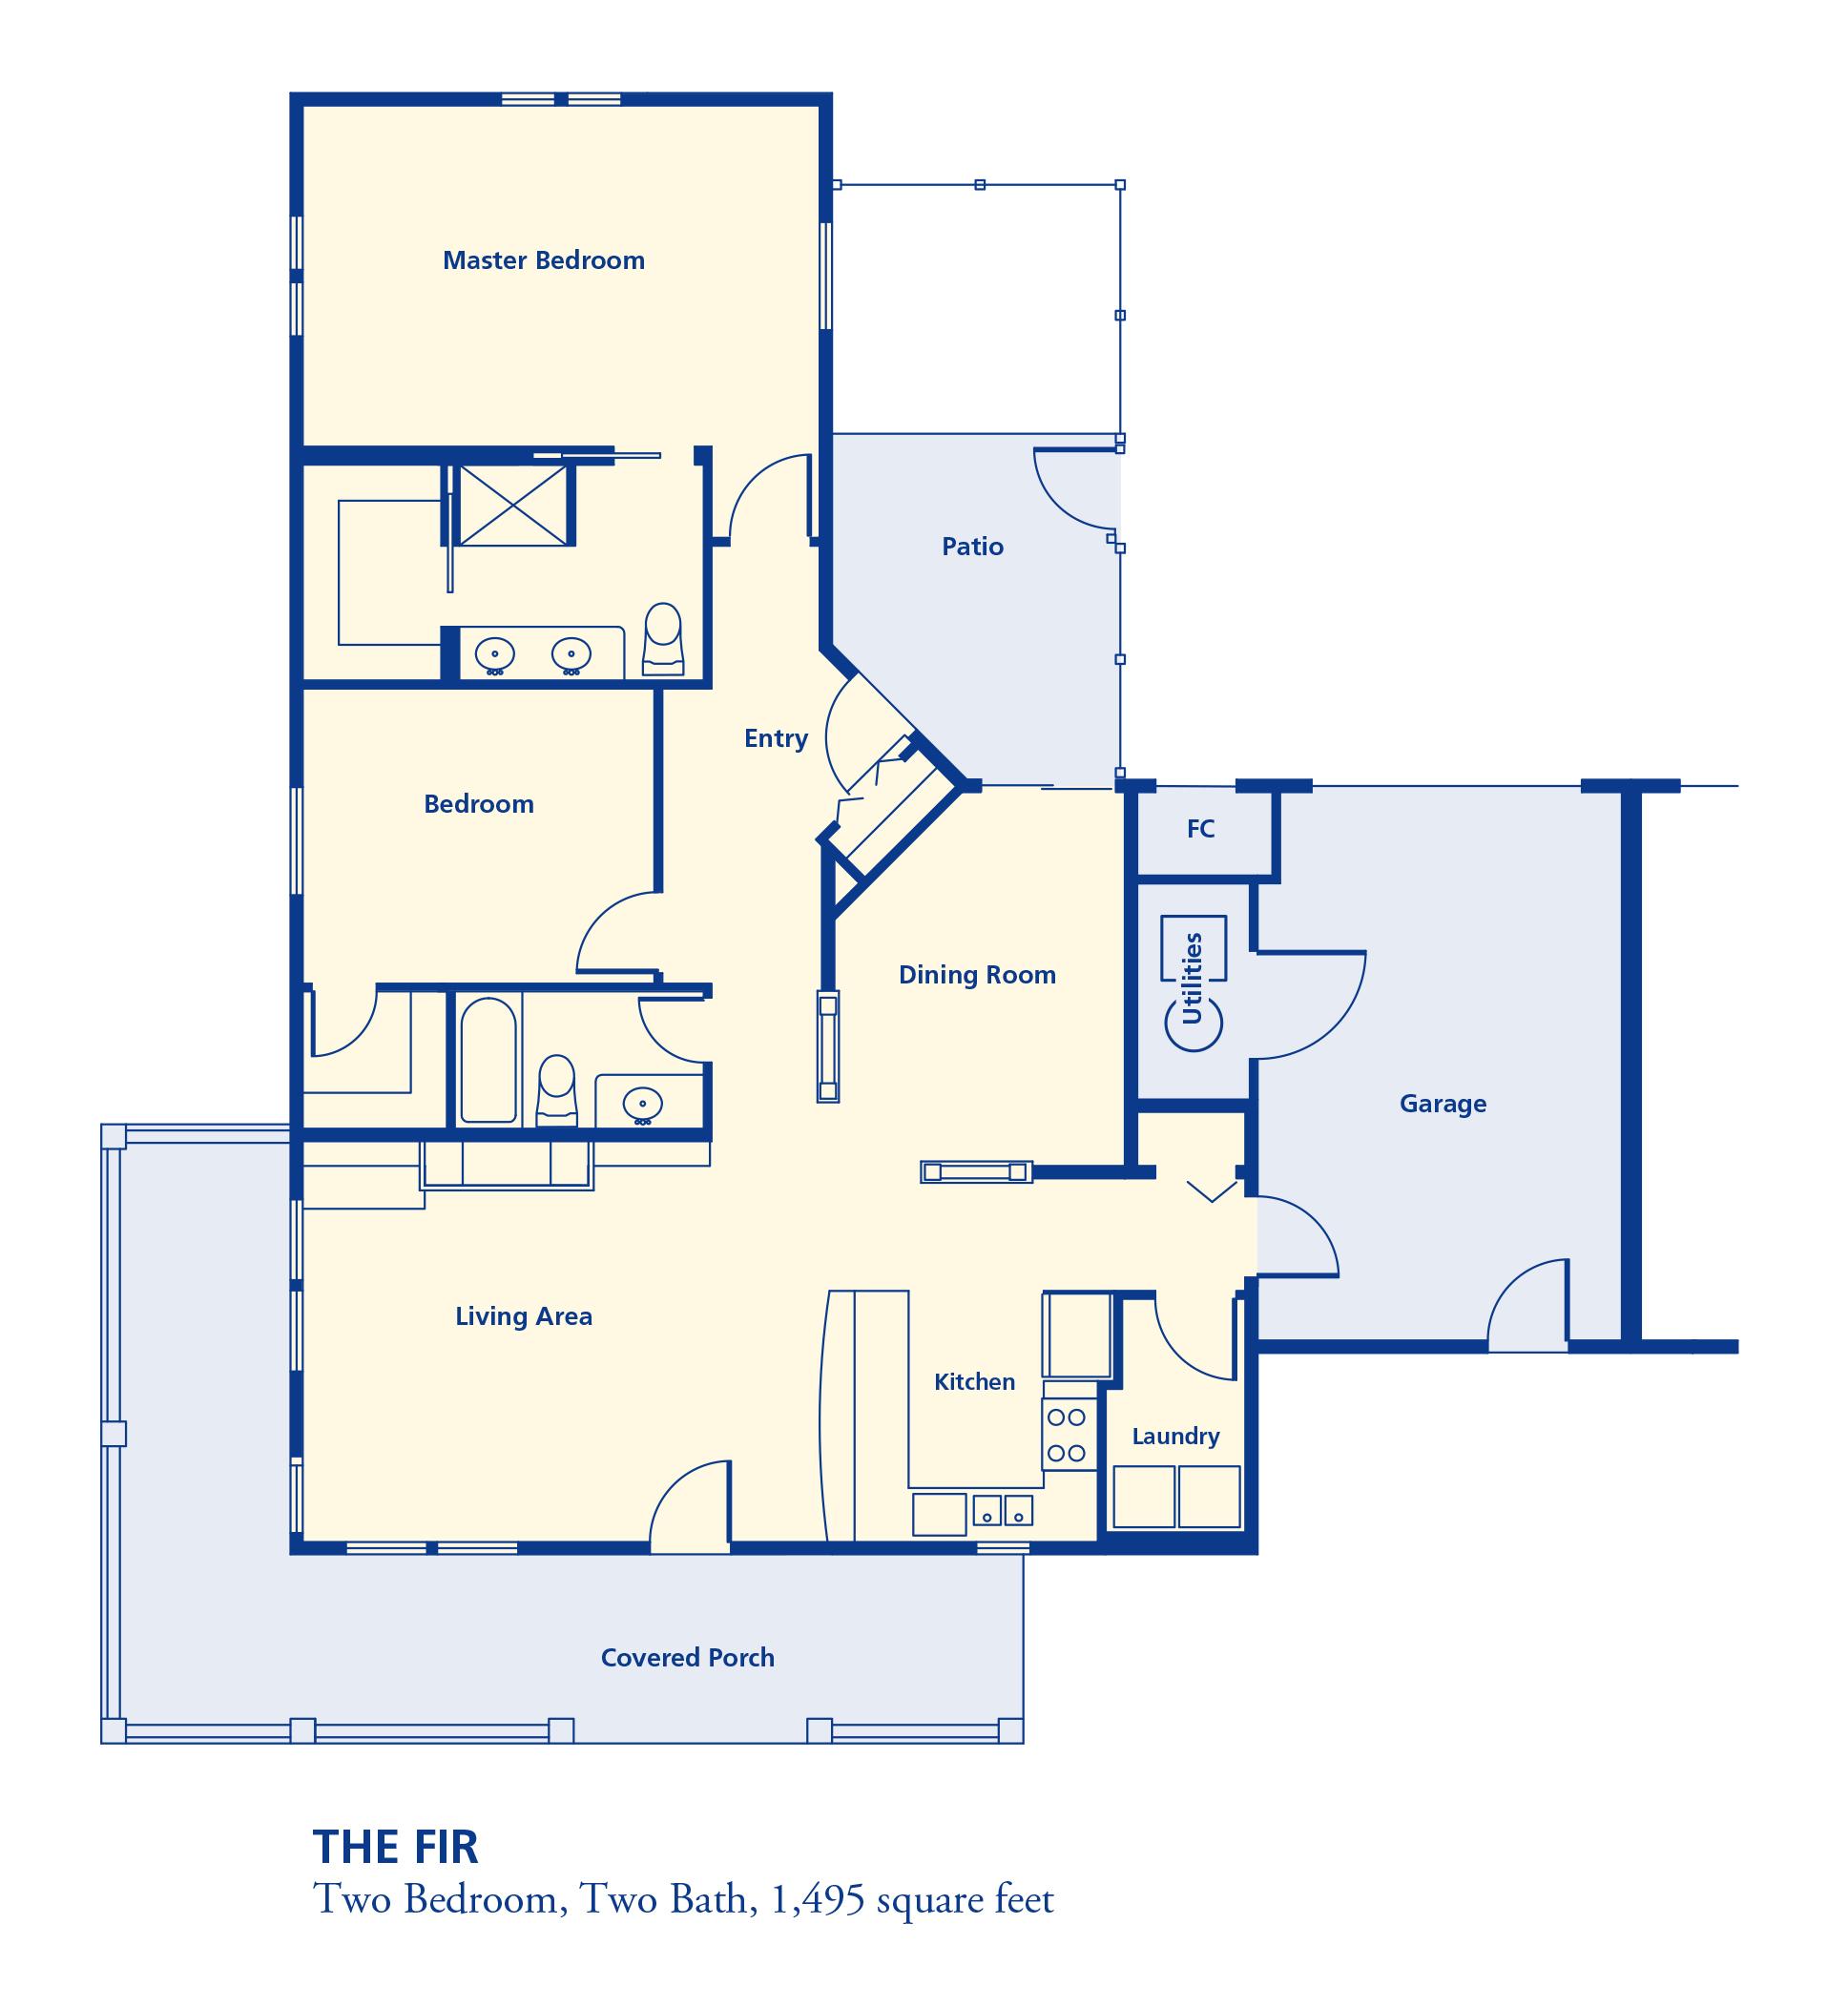 The Fir Two bedroom two bath 1495 square feet senior independent retirement residence living Denver